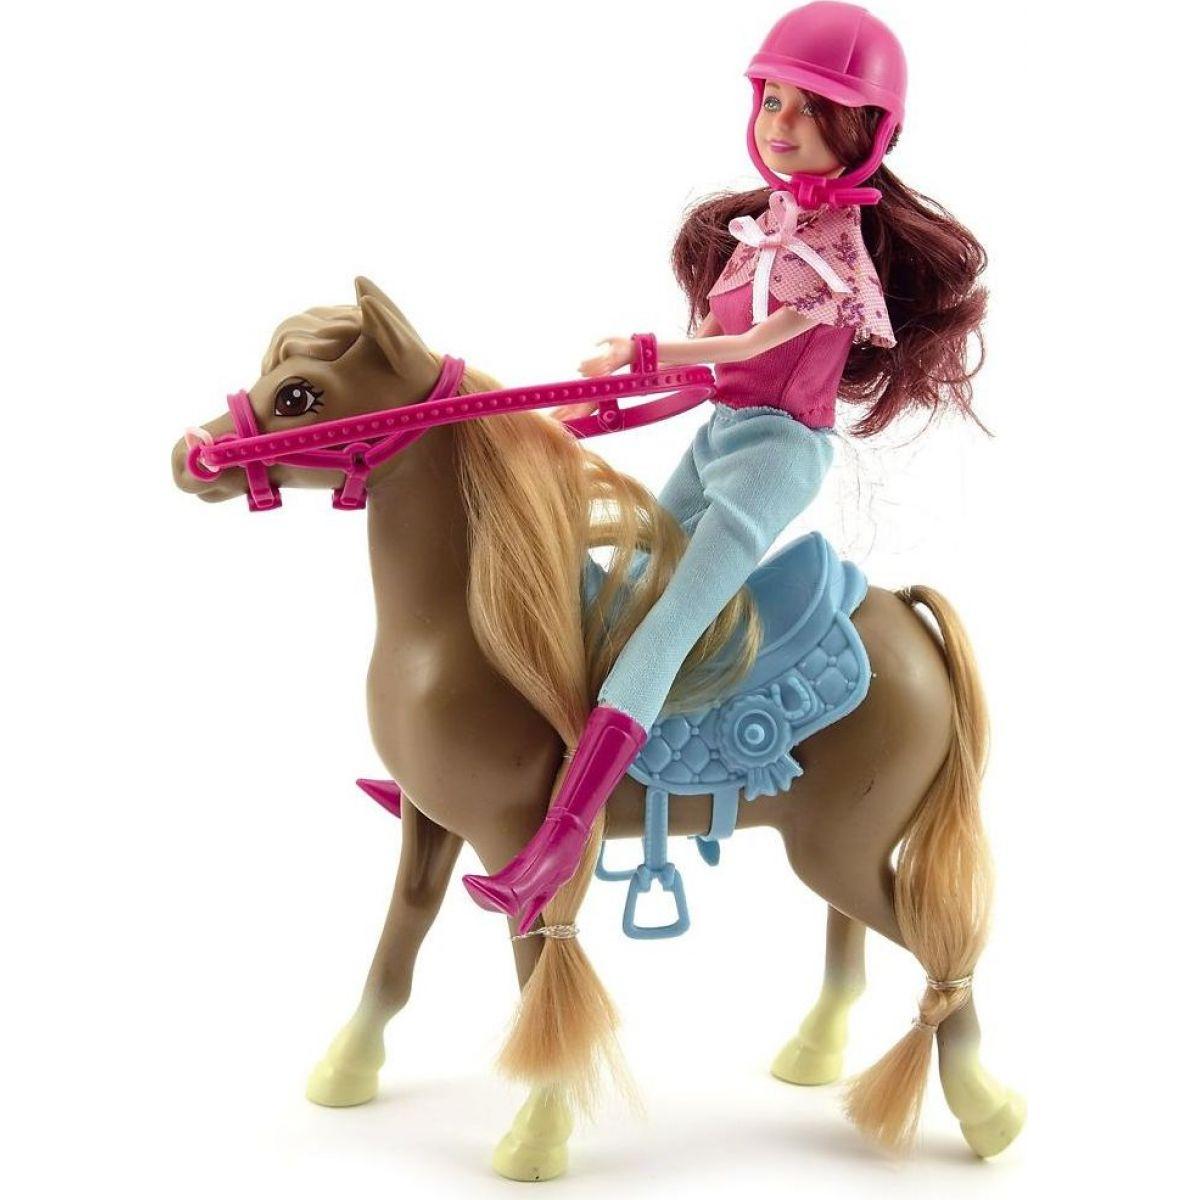 Teddies Kůň + panenka žokejka plast v krabici 34x27x7 cm